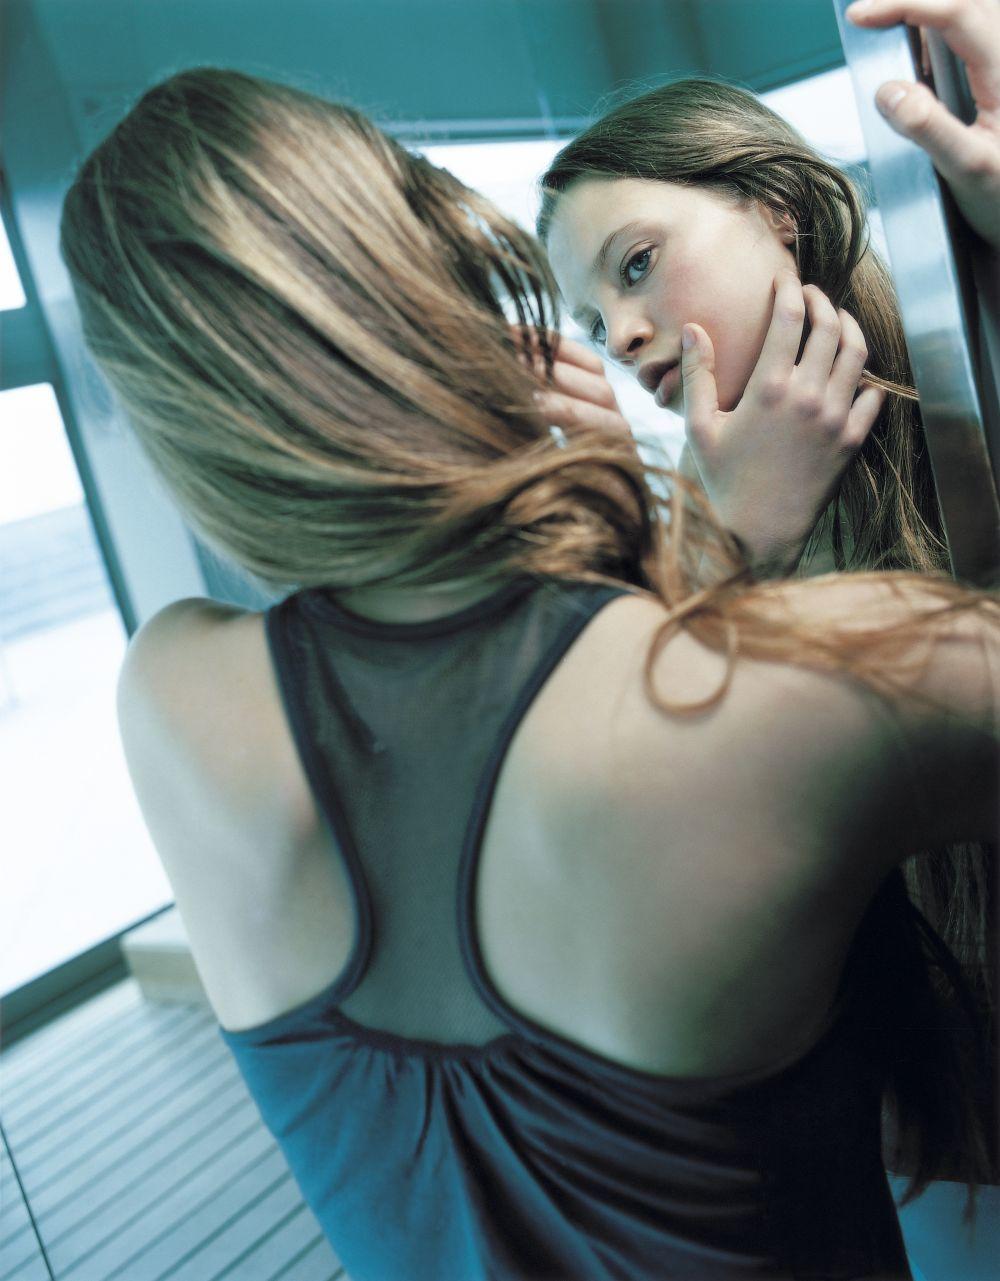 Descubre aquí más bases de maquillaje para pieles grasas.